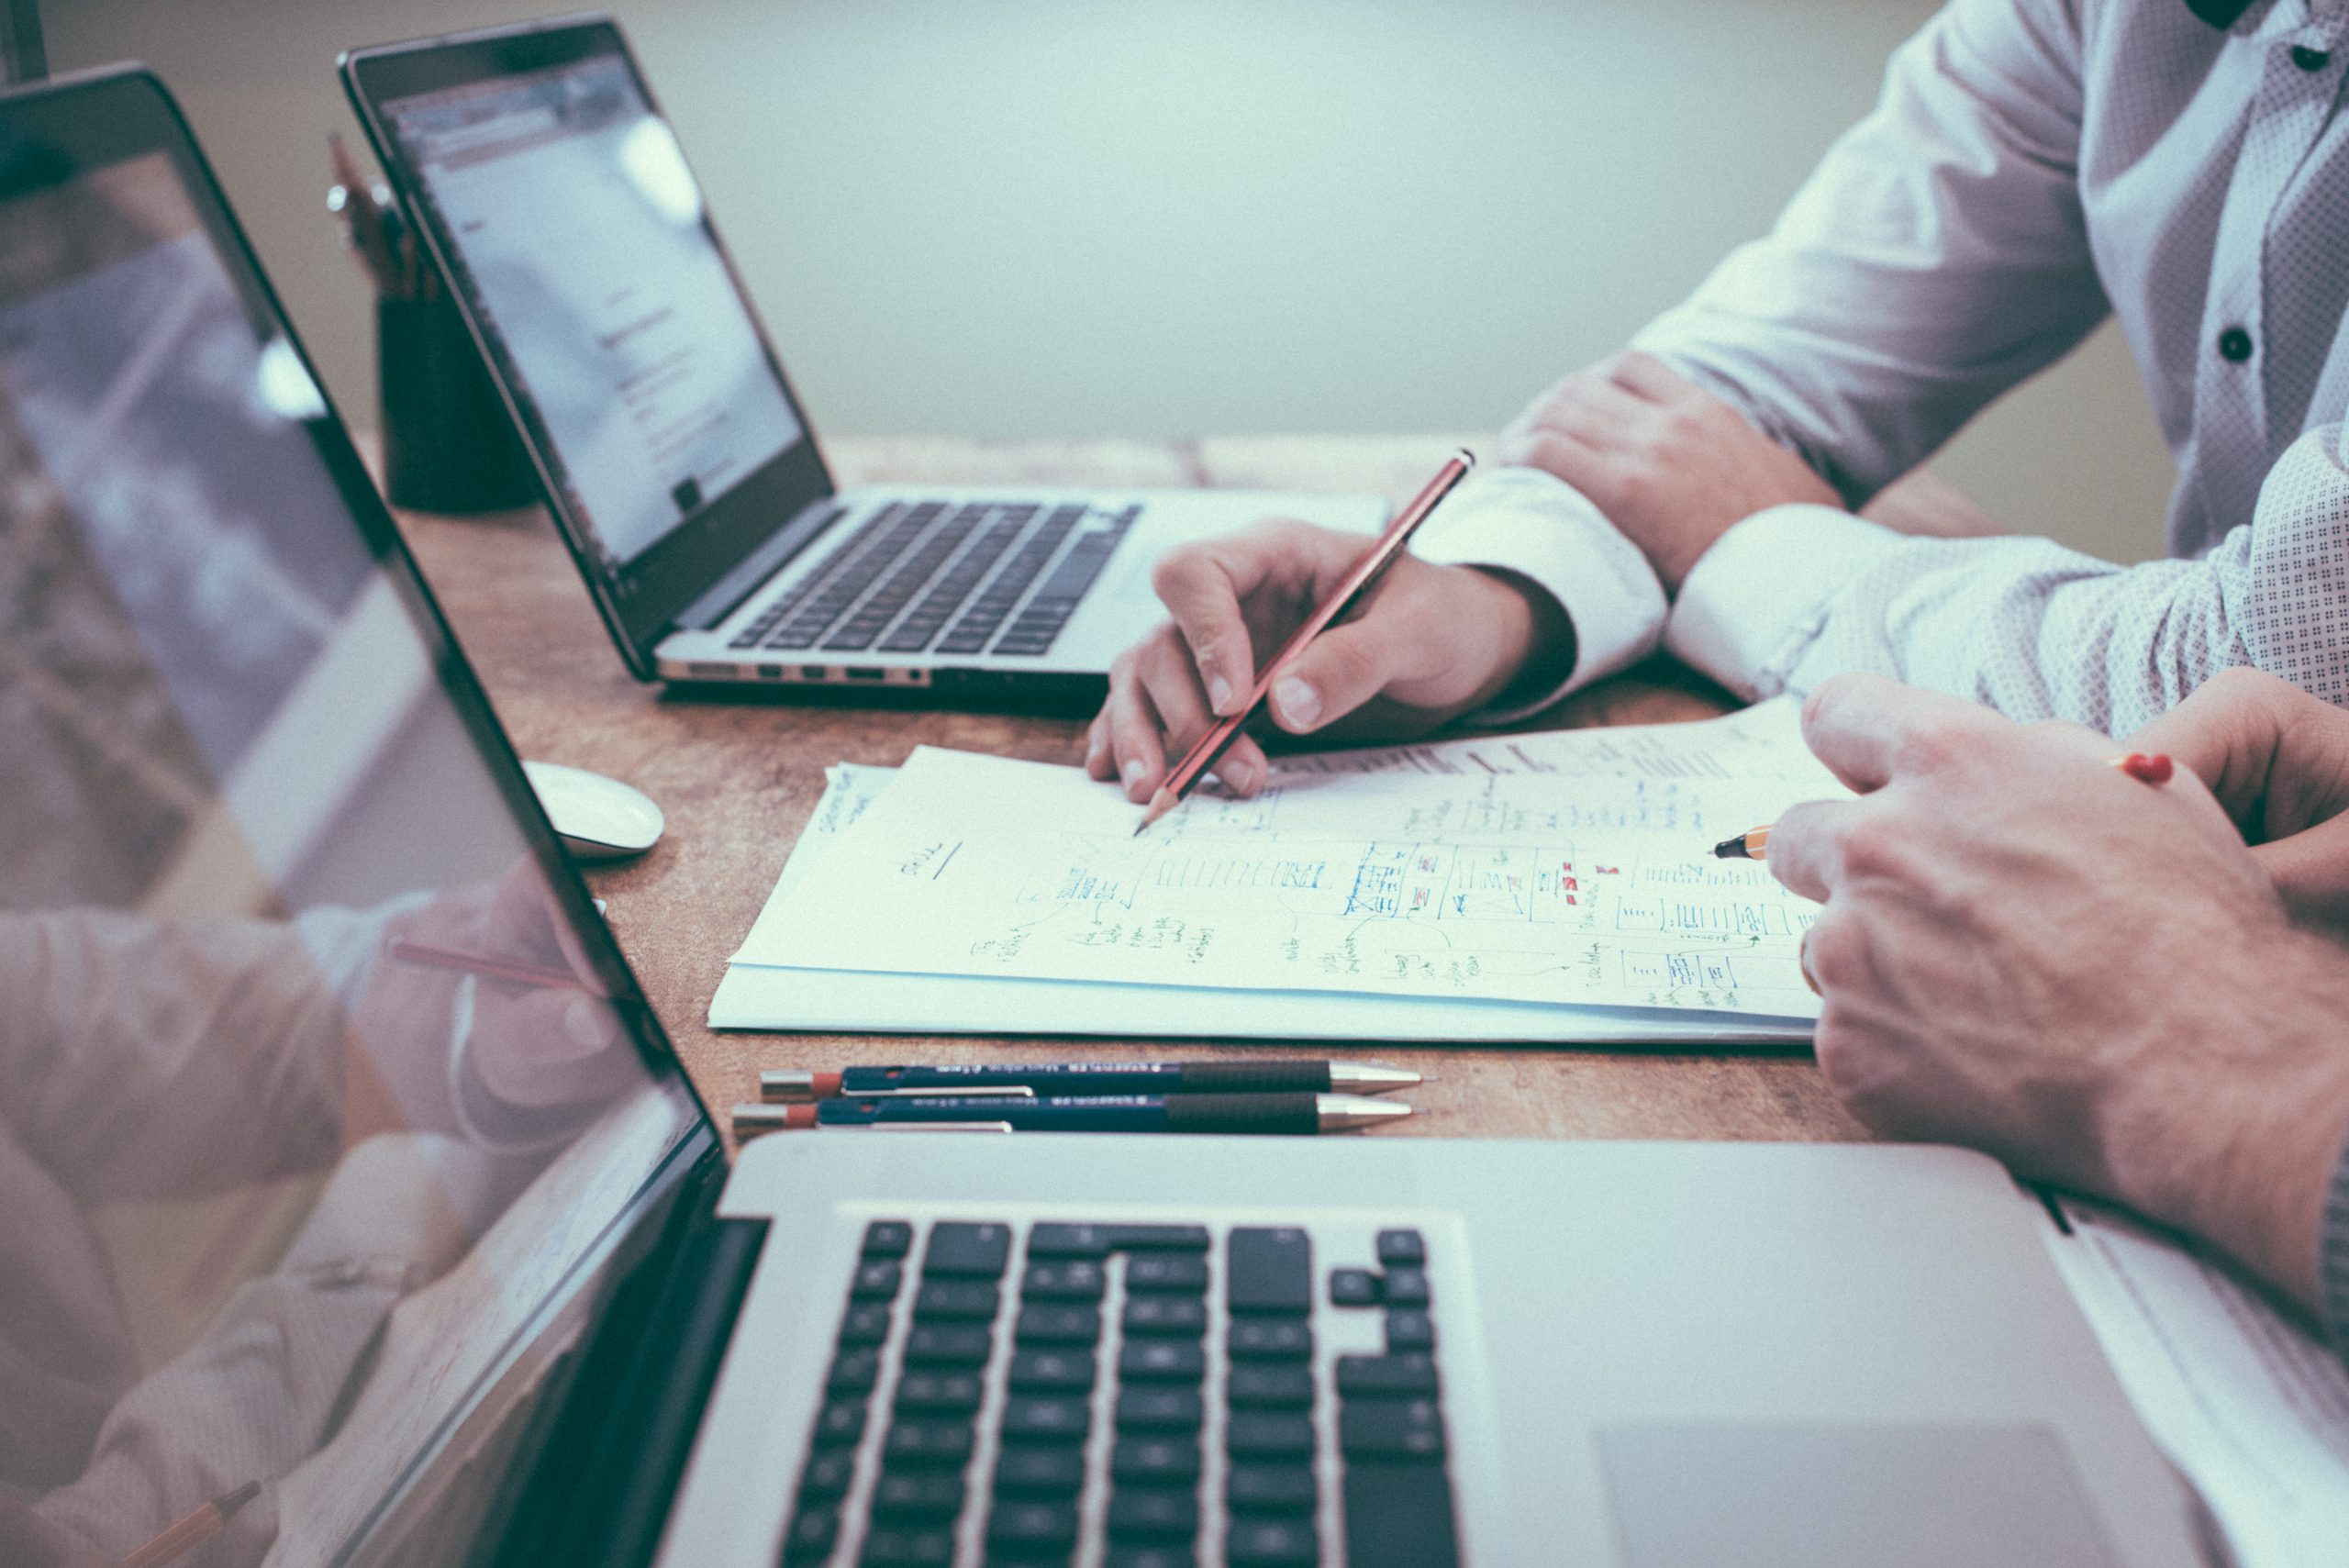 Sightline Webinar: Financial Planning with Objective Financial Partners